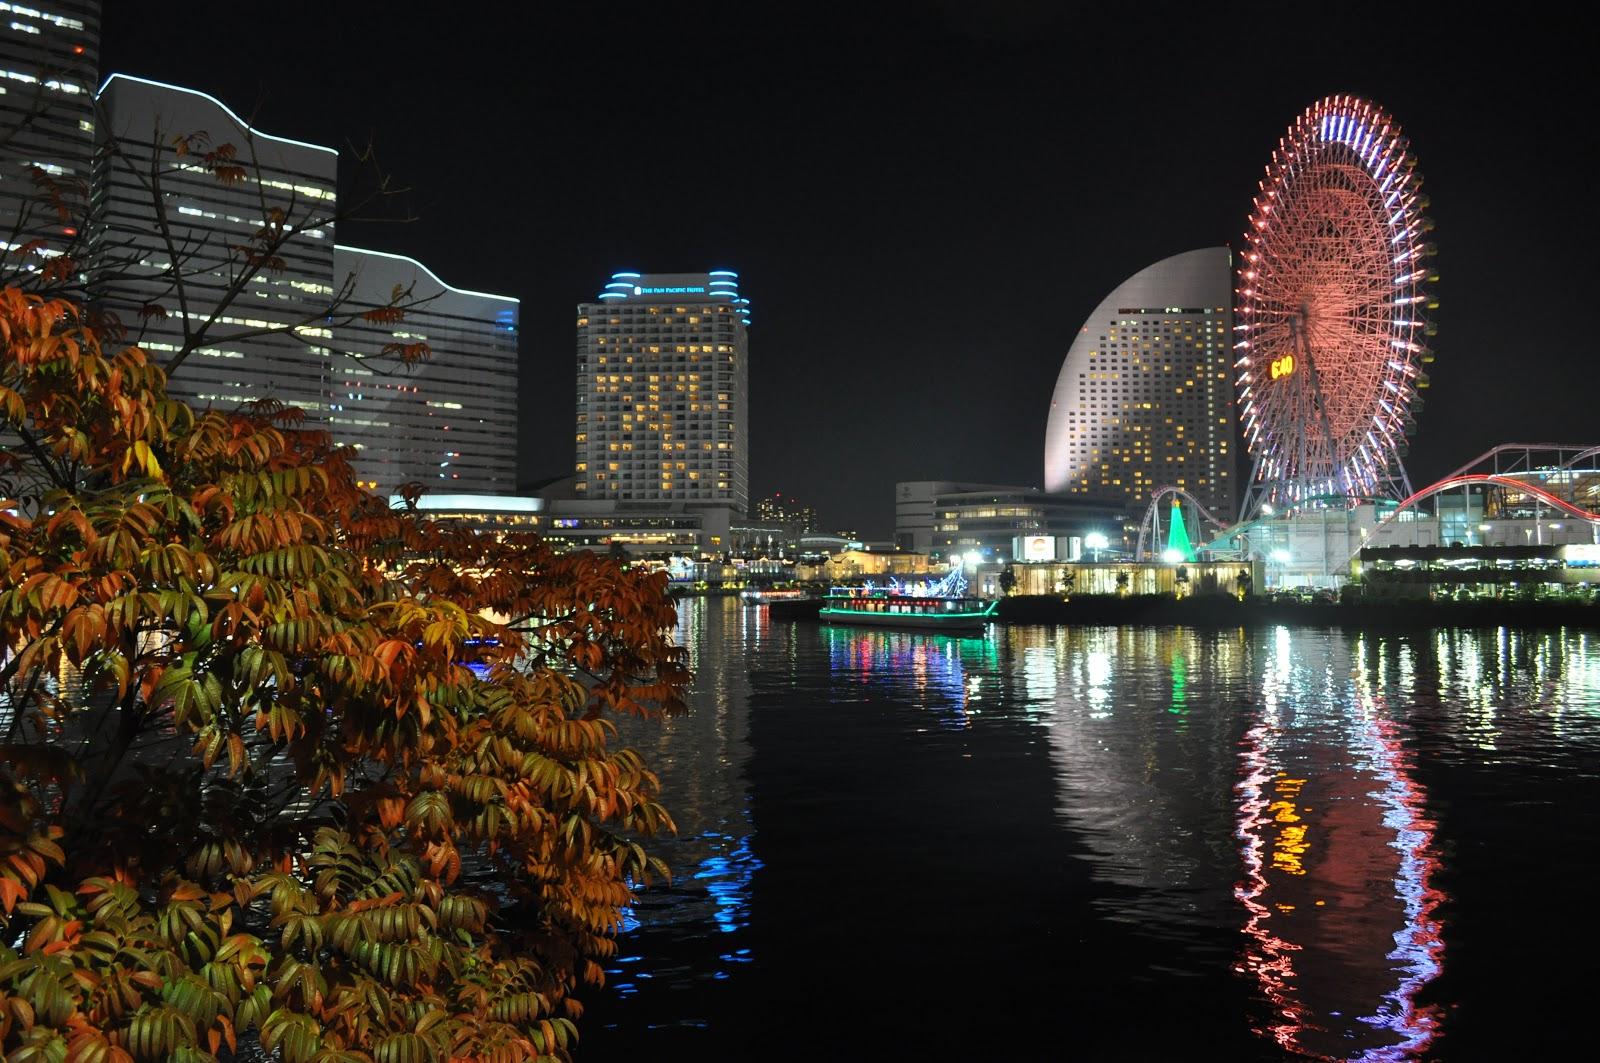 Yokohama Japan  city photos gallery : ... Yokohama 横浜 . A voyage to Yokohama, Kanagawa Prefecture, Japan